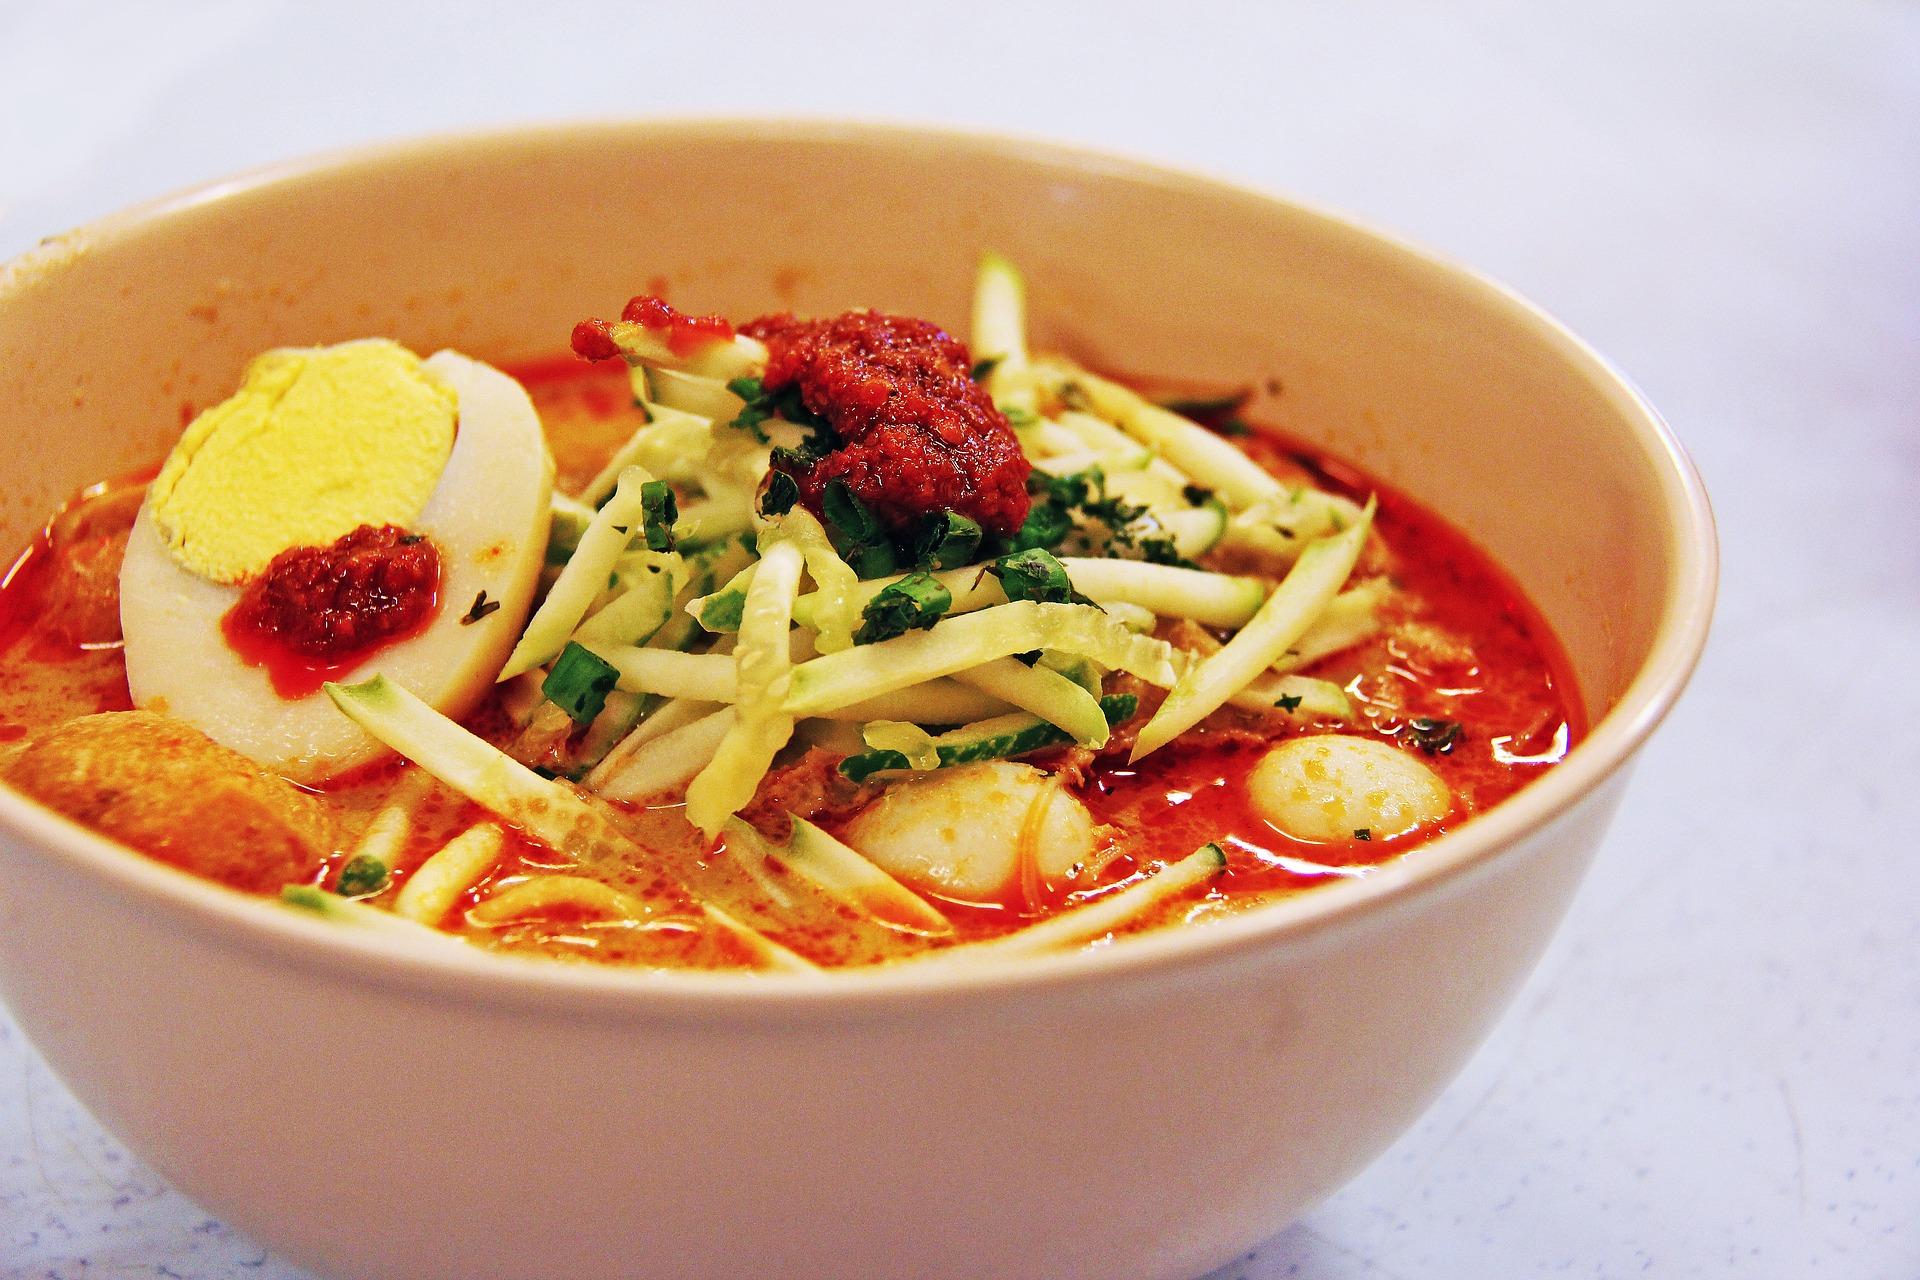 laksa-malaysia-food-travel-creativitywithkay.jpg